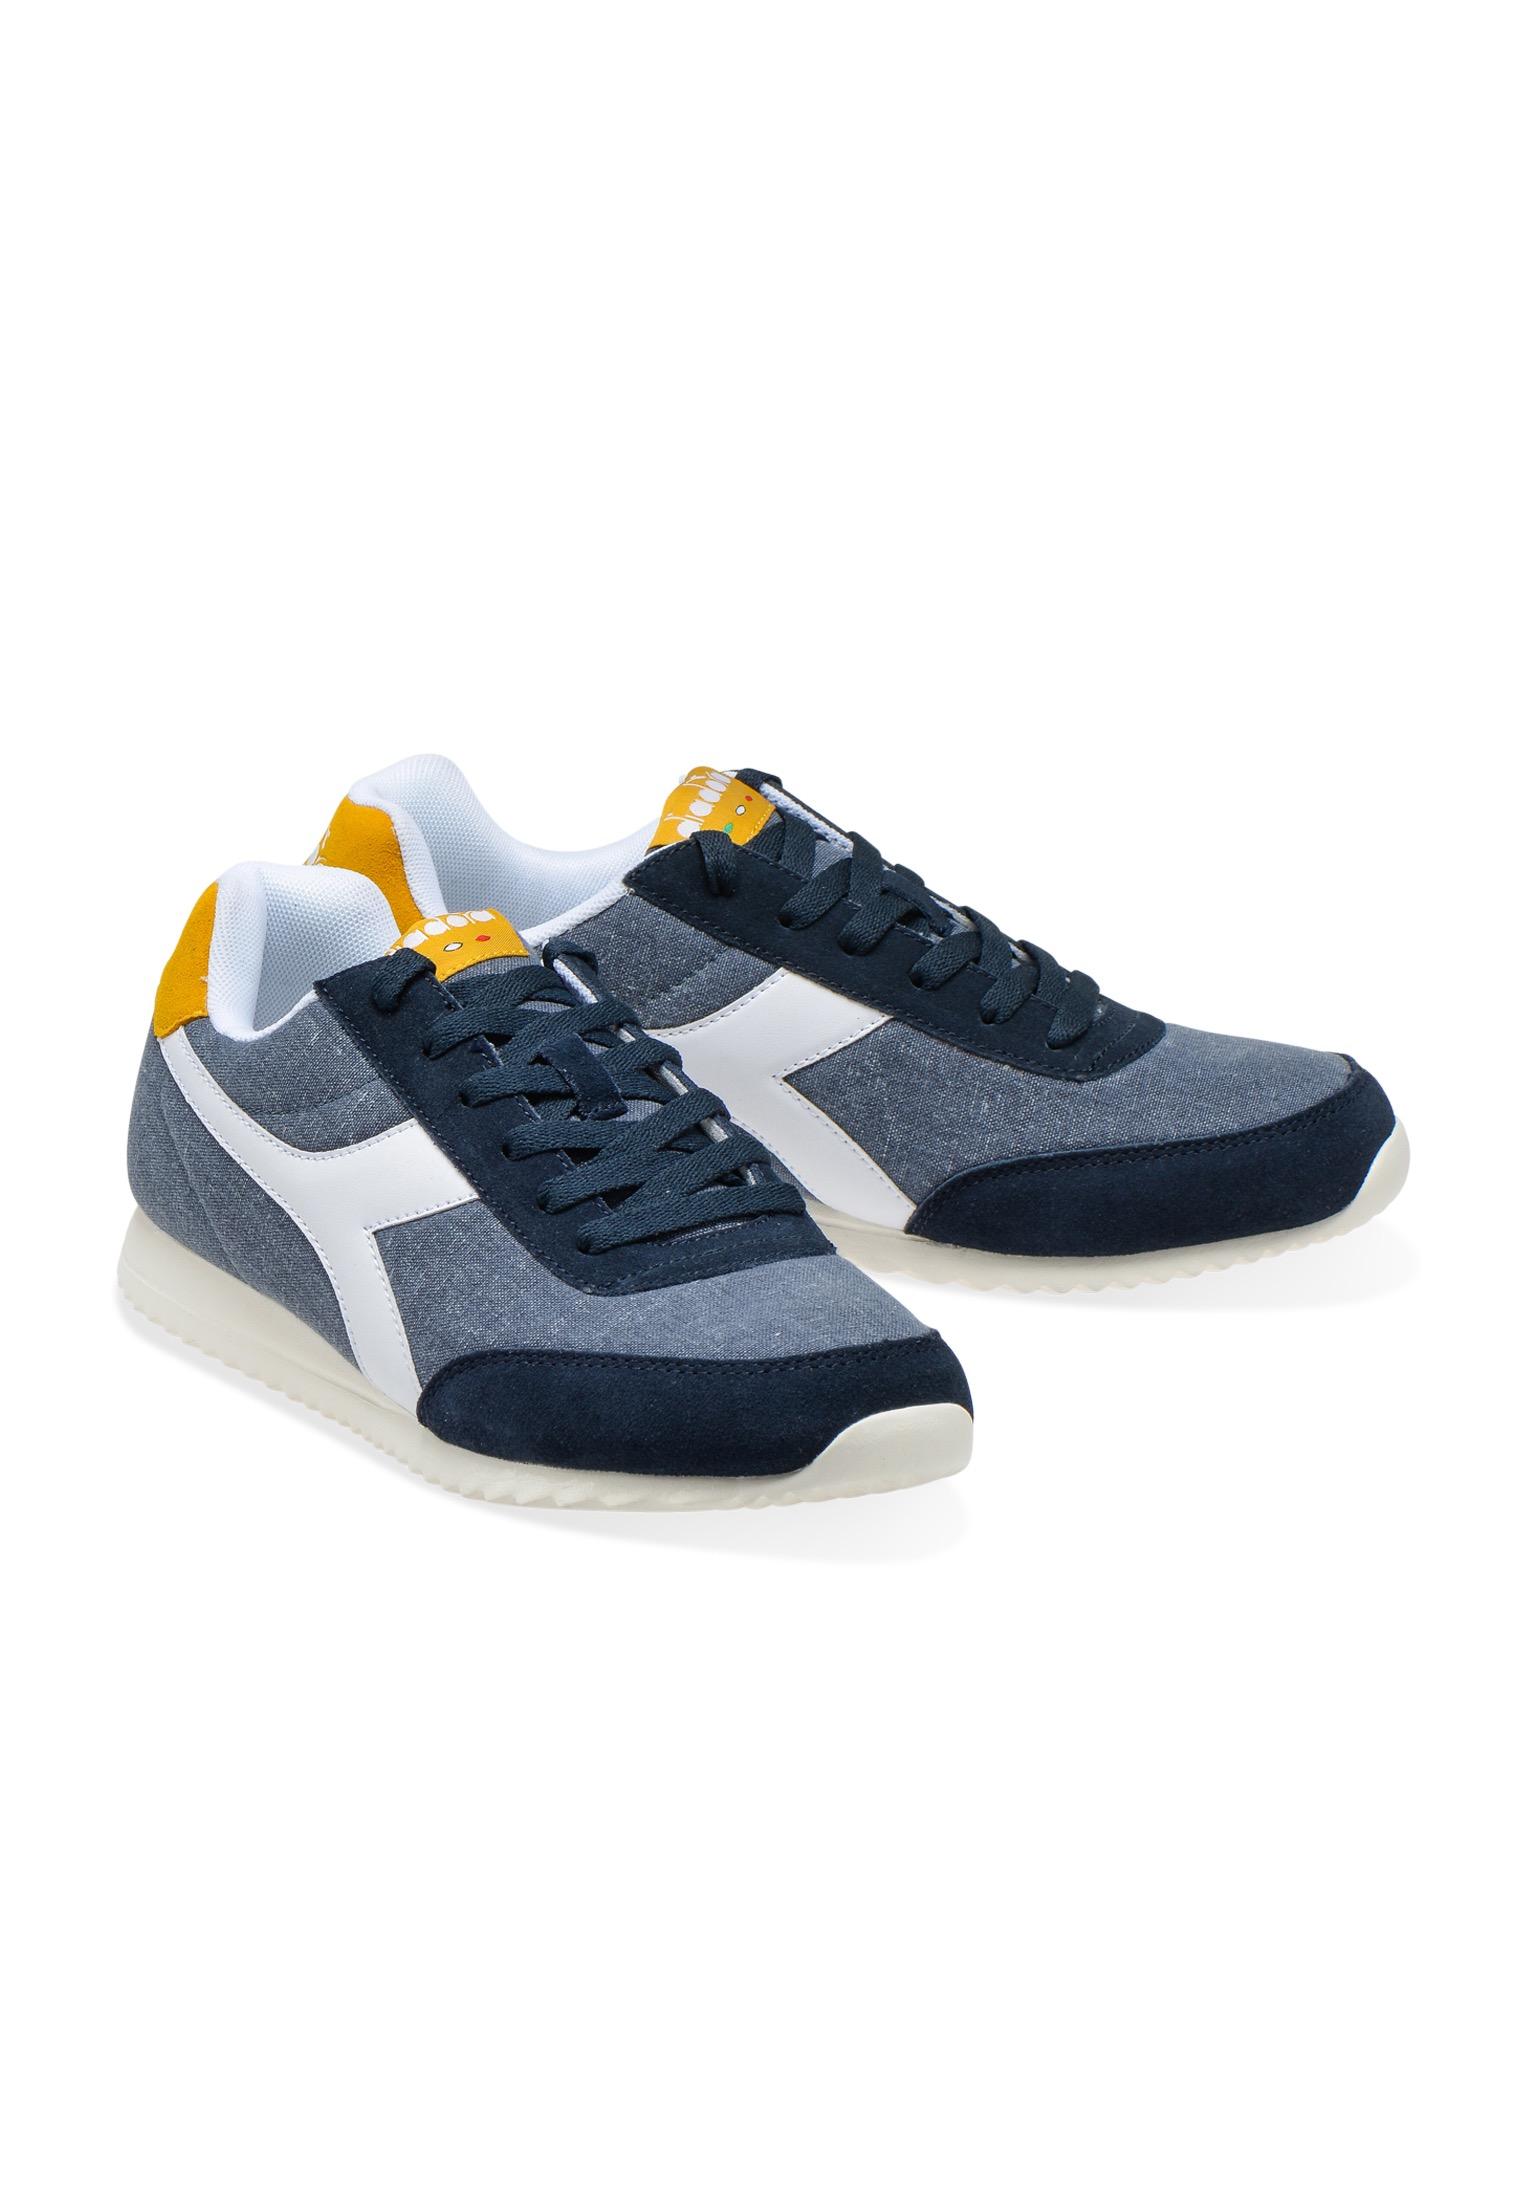 Scarpe-Diadora-Jog-Light-C-Sneakers-sportive-uomo-donna-vari-colori-e-taglie miniatura 59